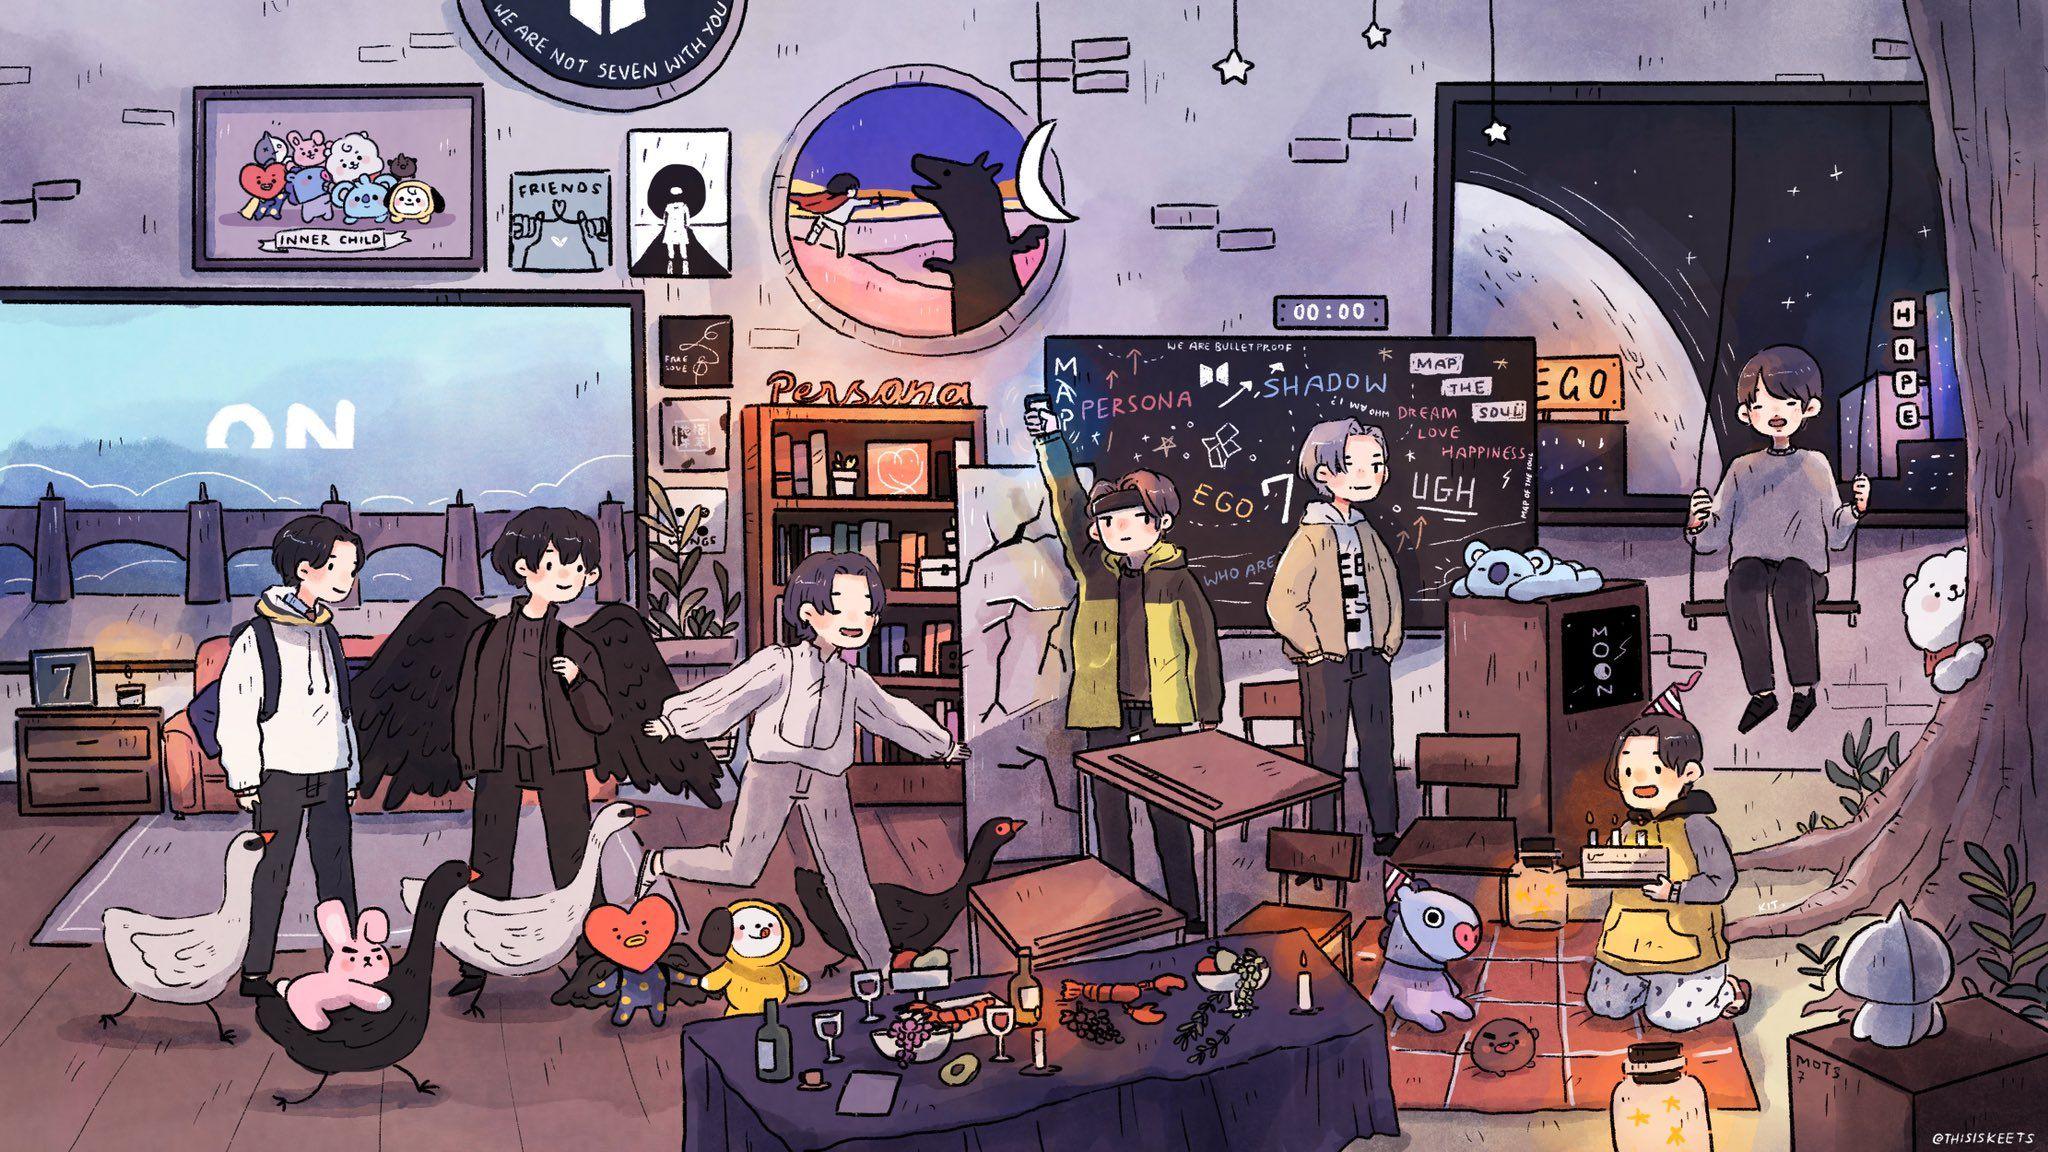 Twitter Bts Drawings Bts Fanart Bts Chibi Bts anime wallpaper laptop